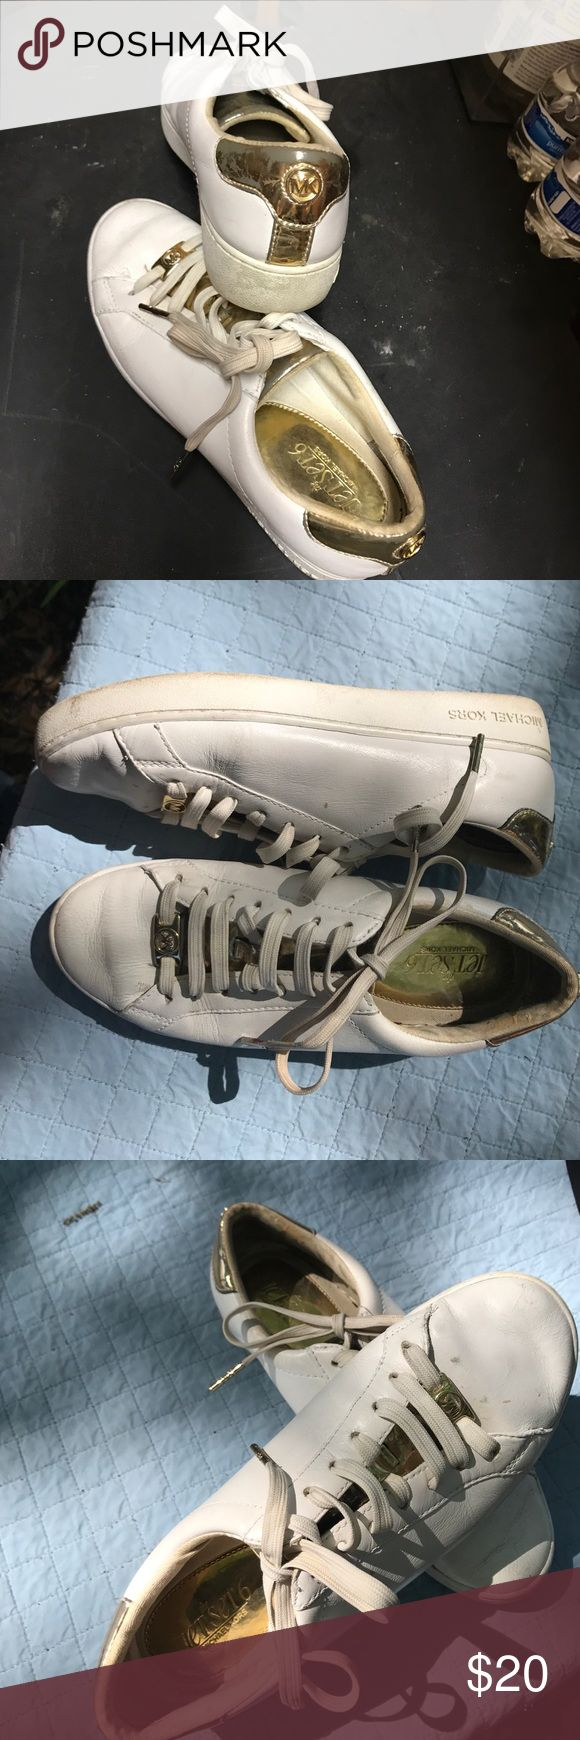 Michael Kors Jet Set 6 Size 5 1/2 M Michael Kors Shoes Sneakers